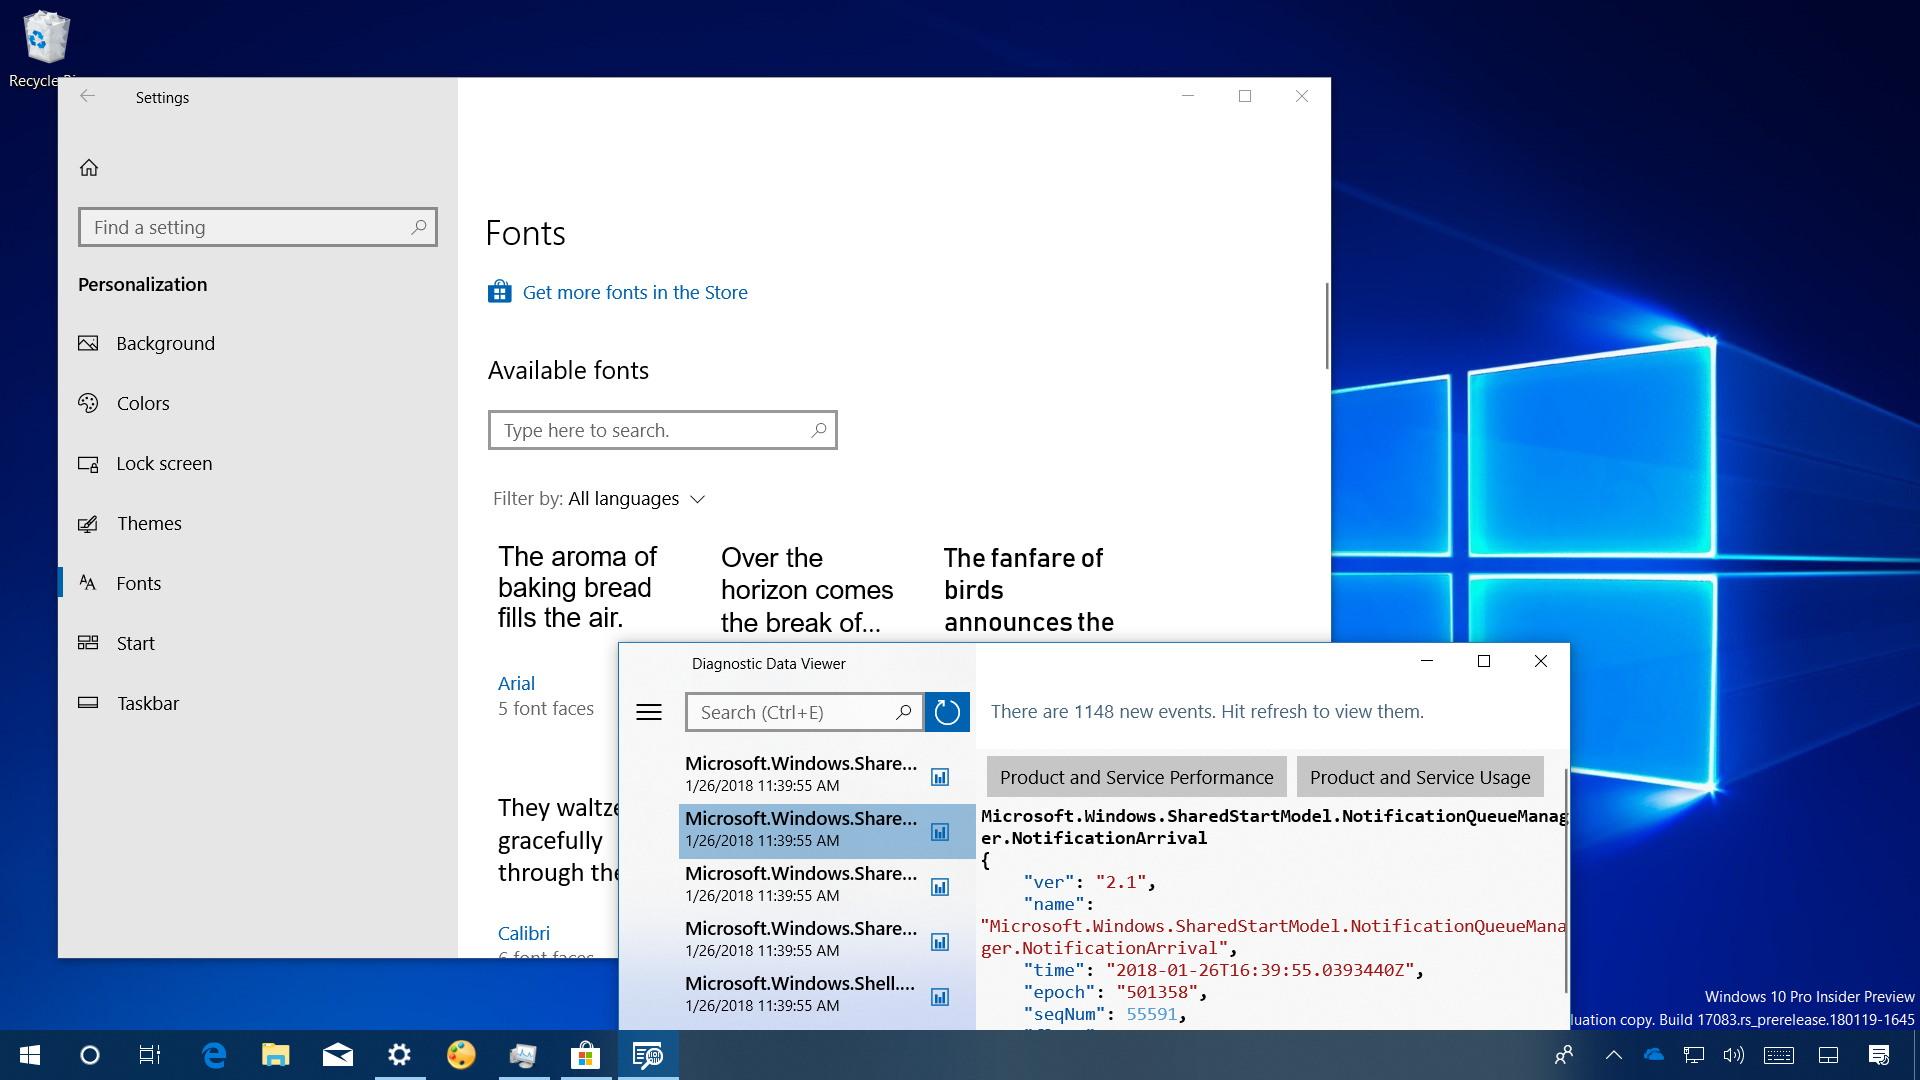 Windows 10 build 17083 video review